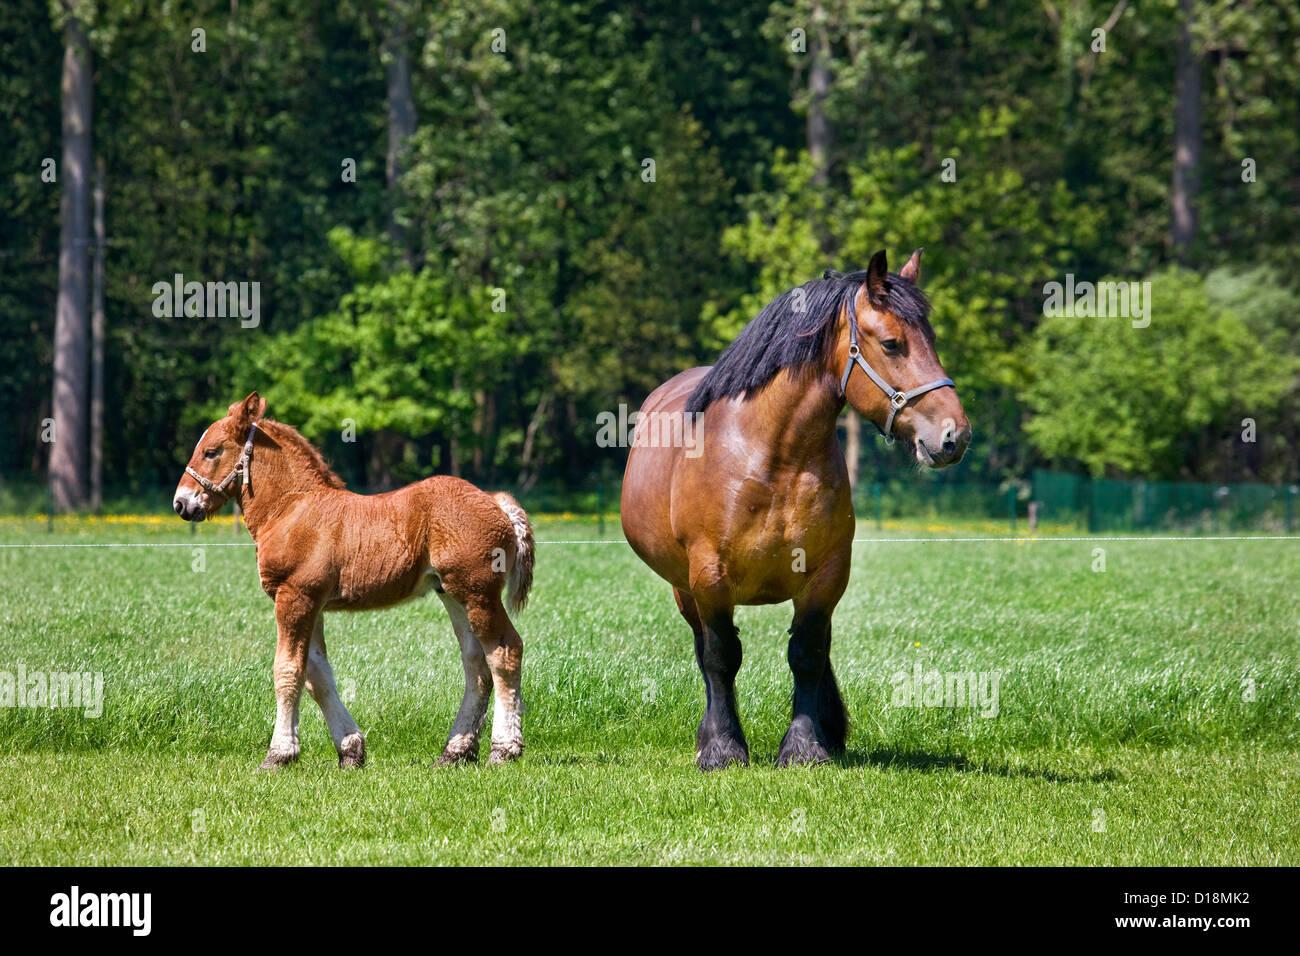 Foal and mare Belgian draft horse / Belgian Heavy Horse / Brabançon / Brabant, draft horse breed in Belgium - Stock Image